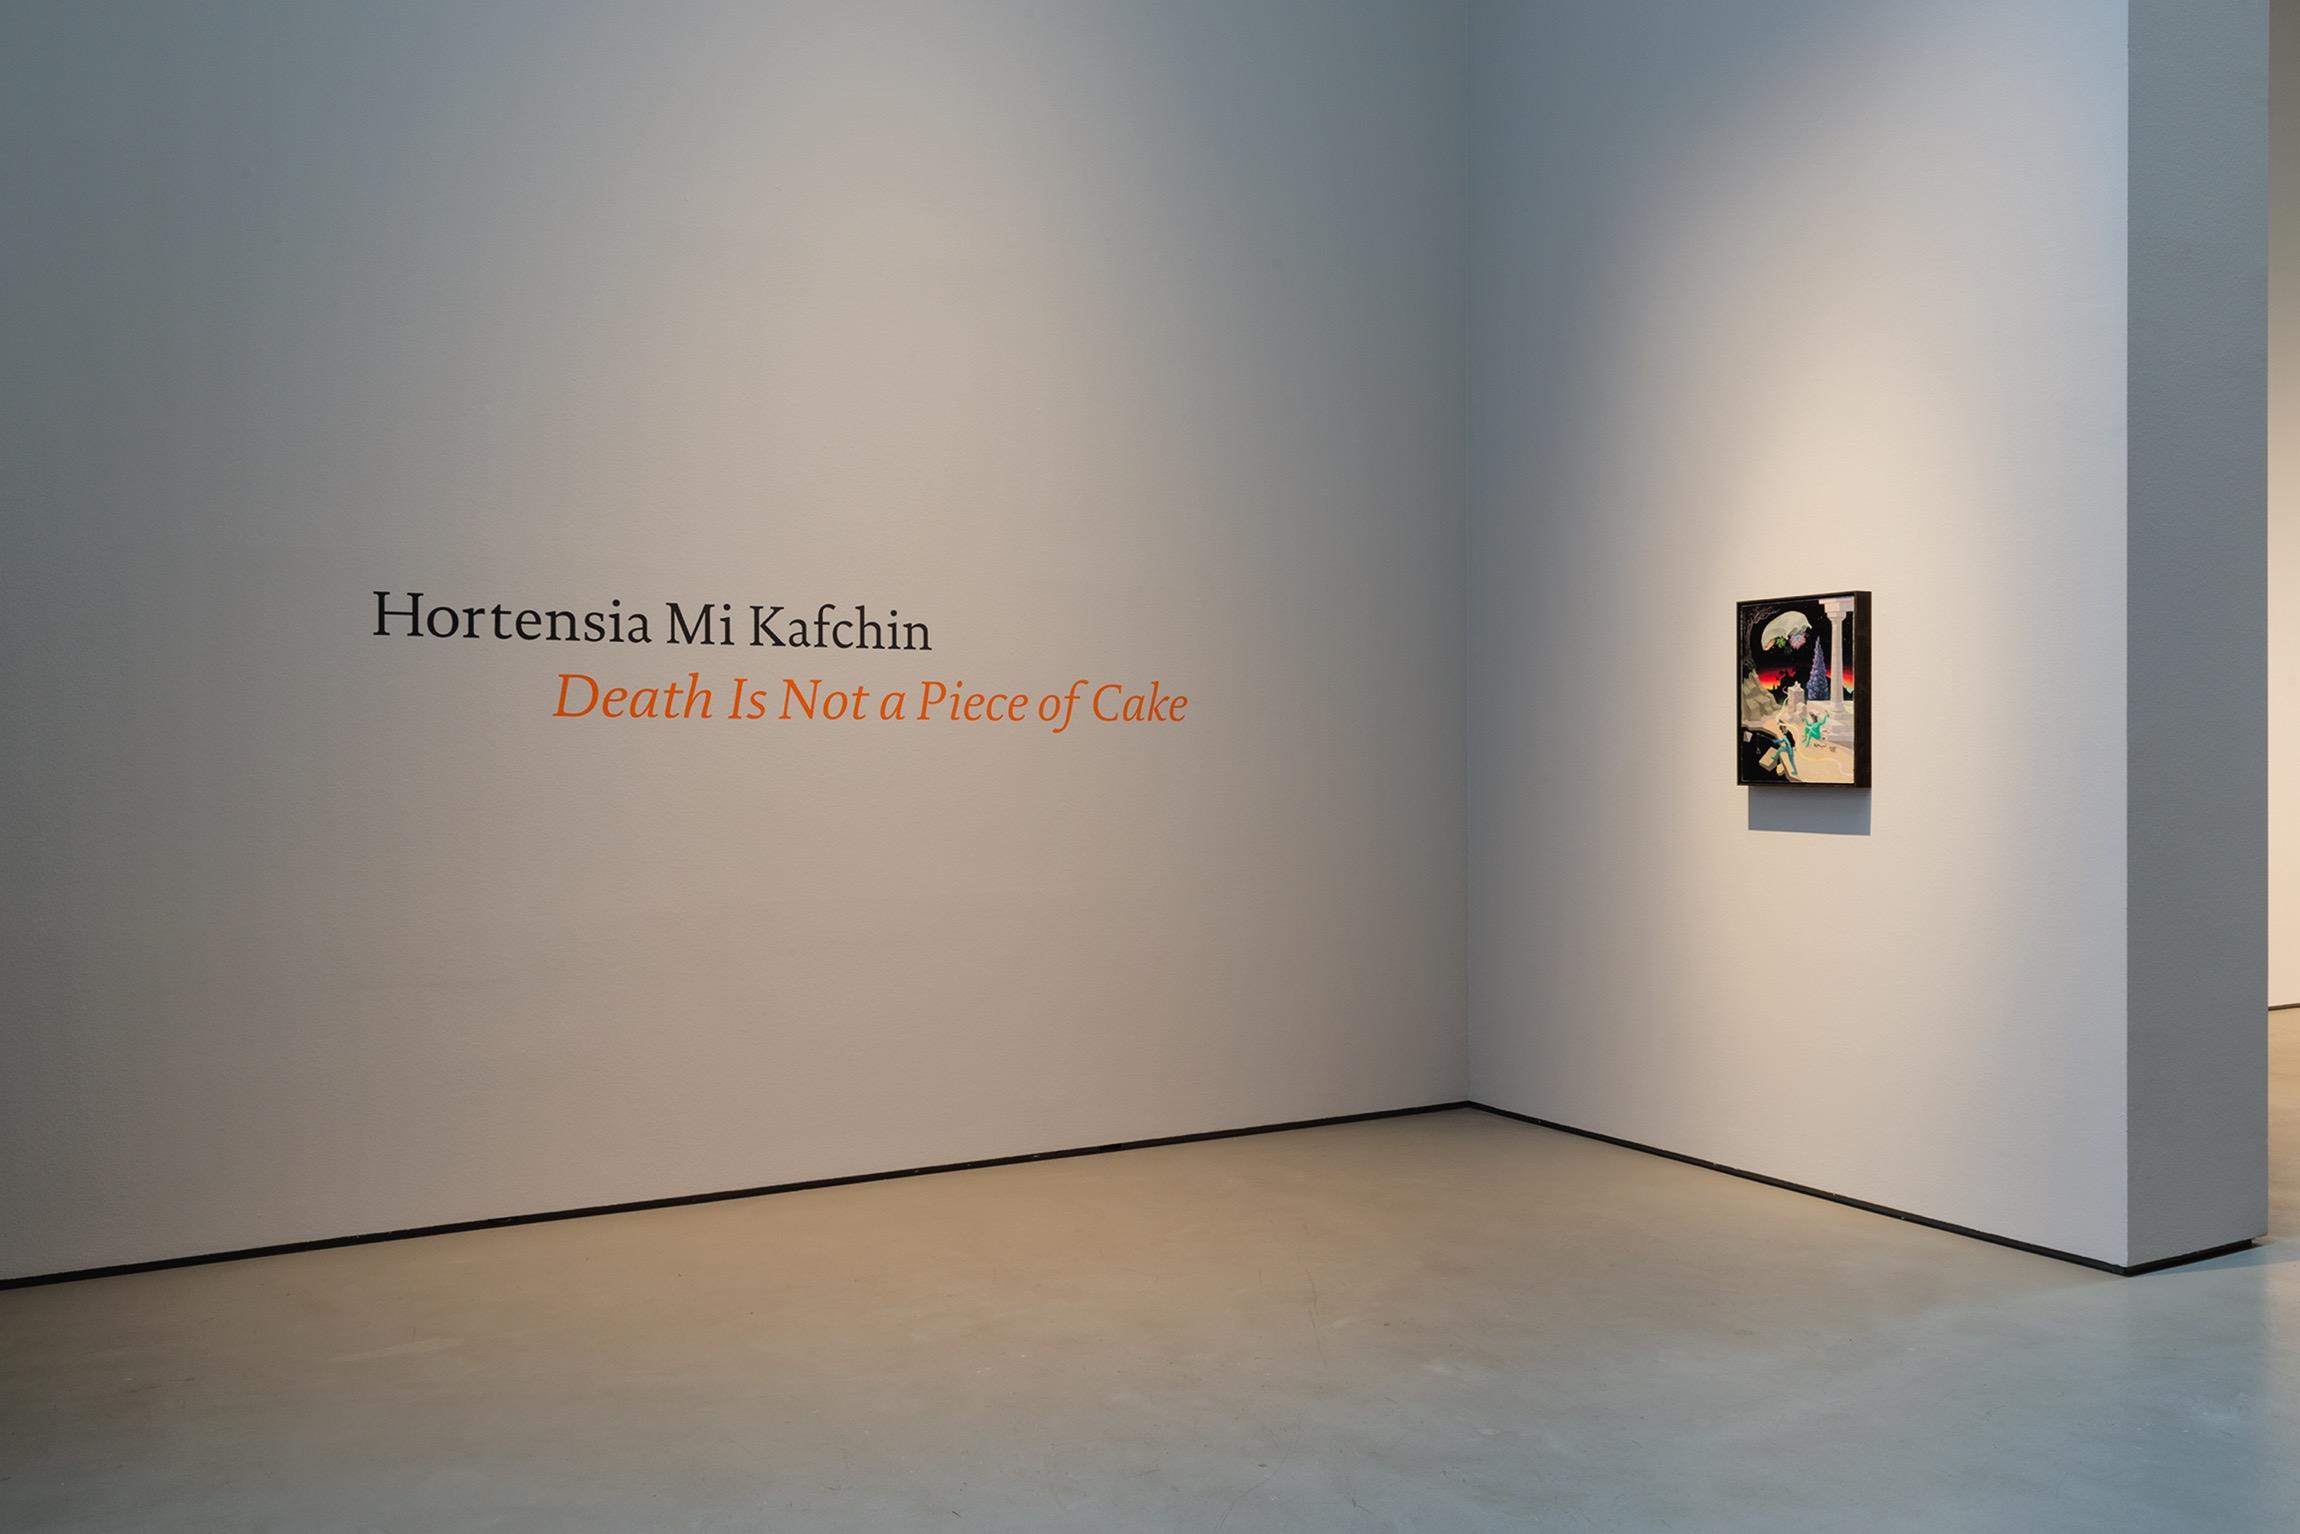 Hortensia Mi Kafchin Death Is Not a Piece of Cake Galerie Judin